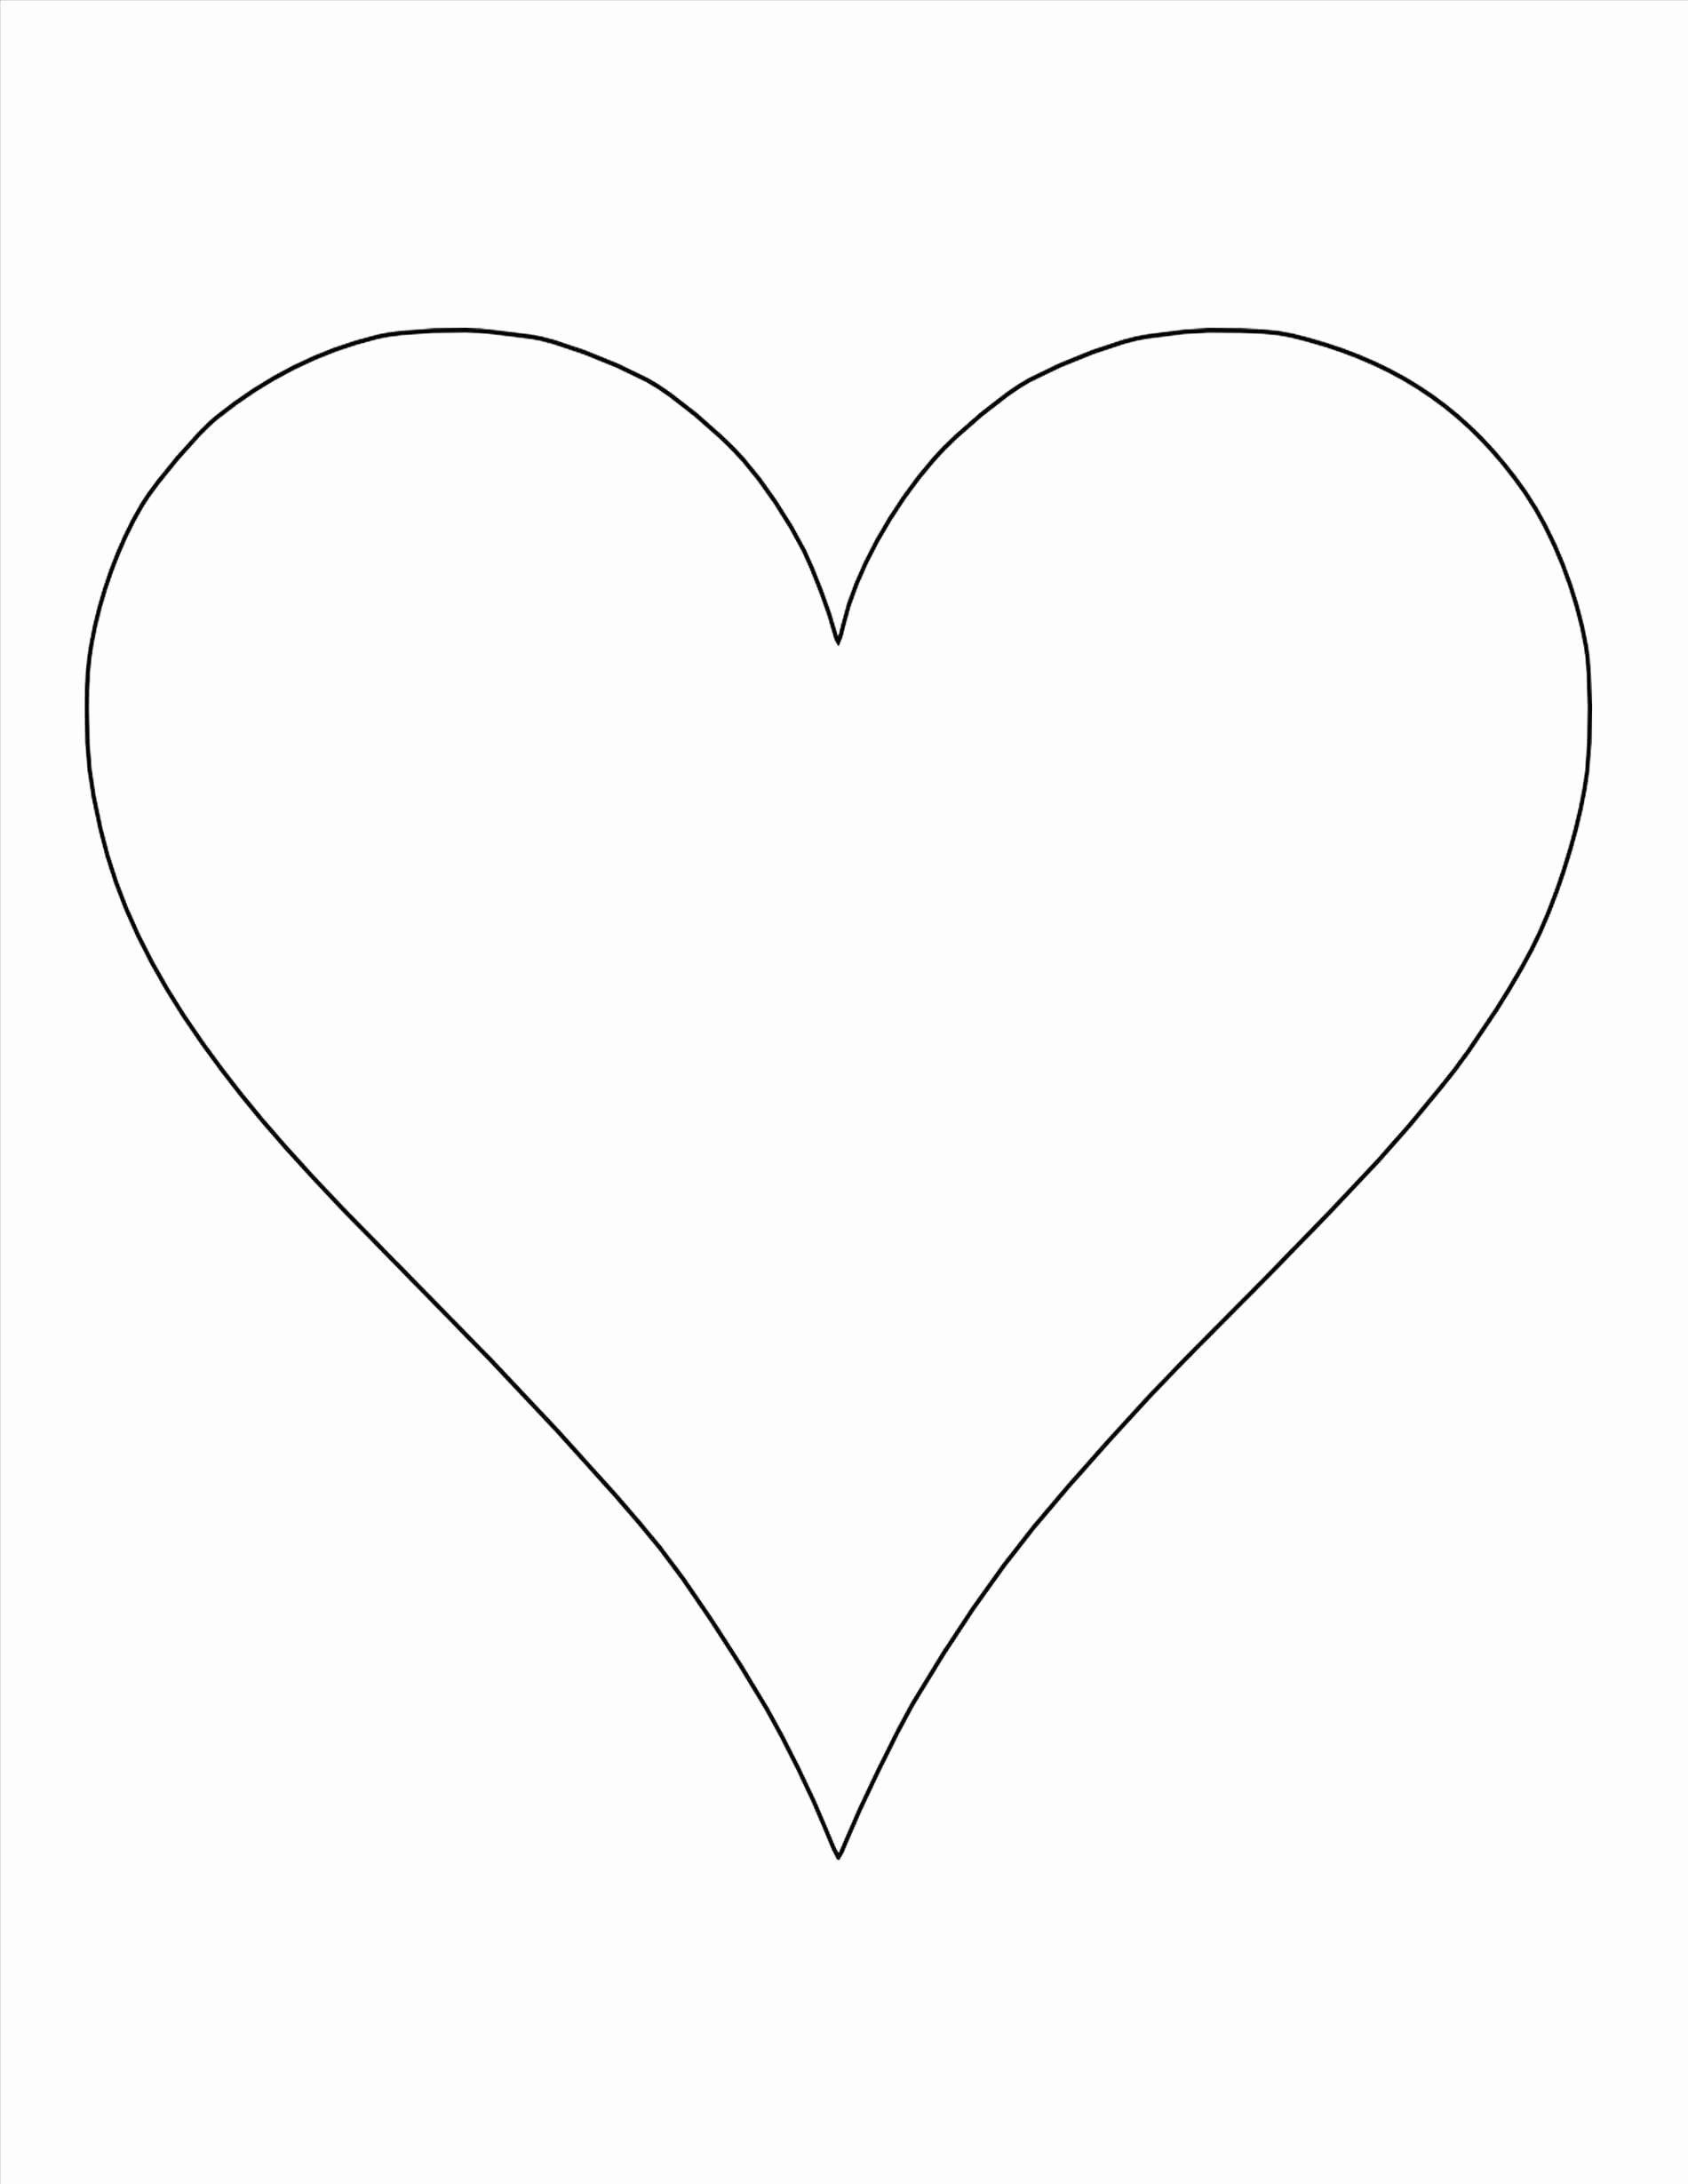 Heart Template Pdf